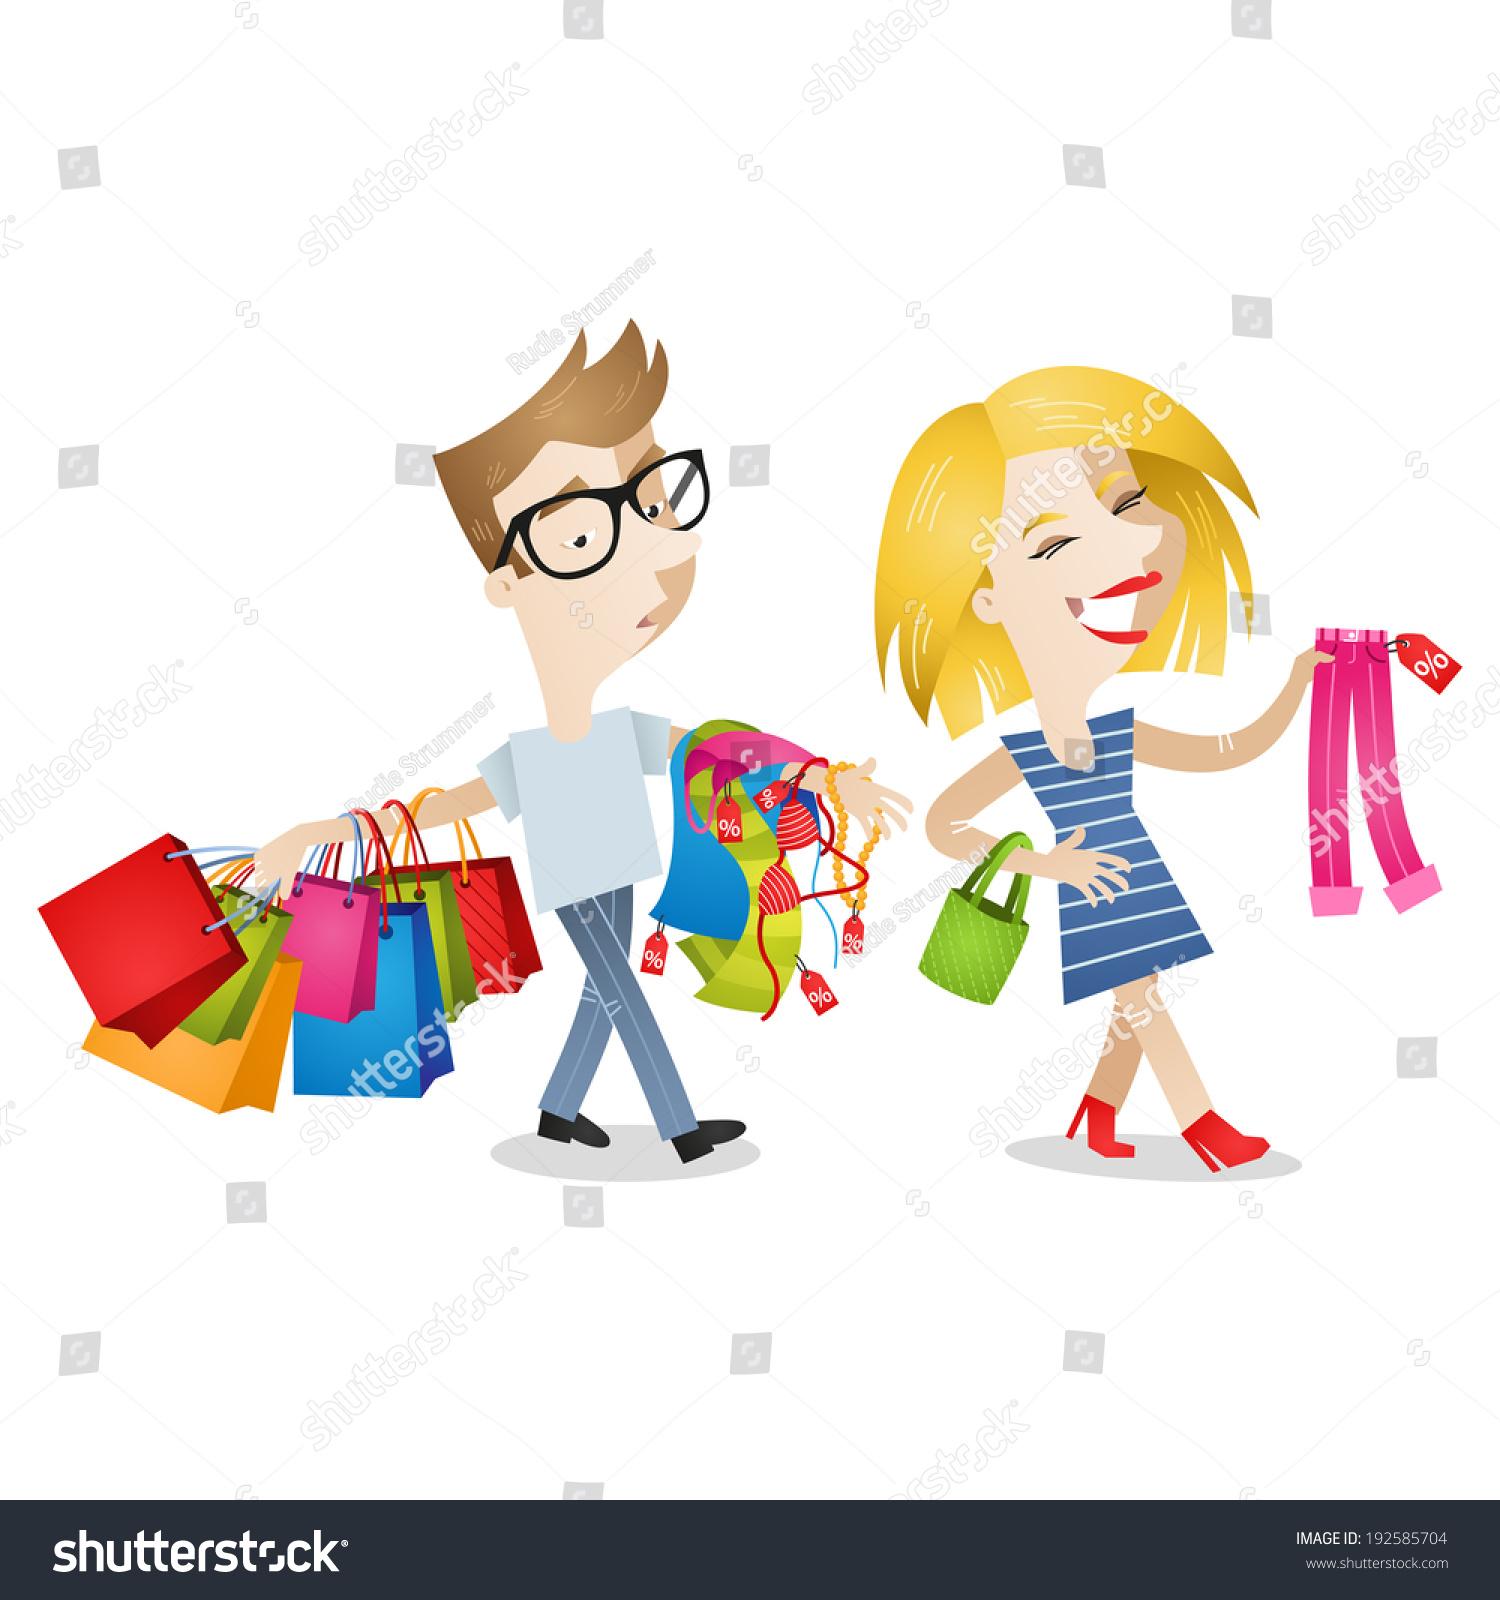 Cartoon Characters Clothes : Clothes shopping cartoon pixshark images